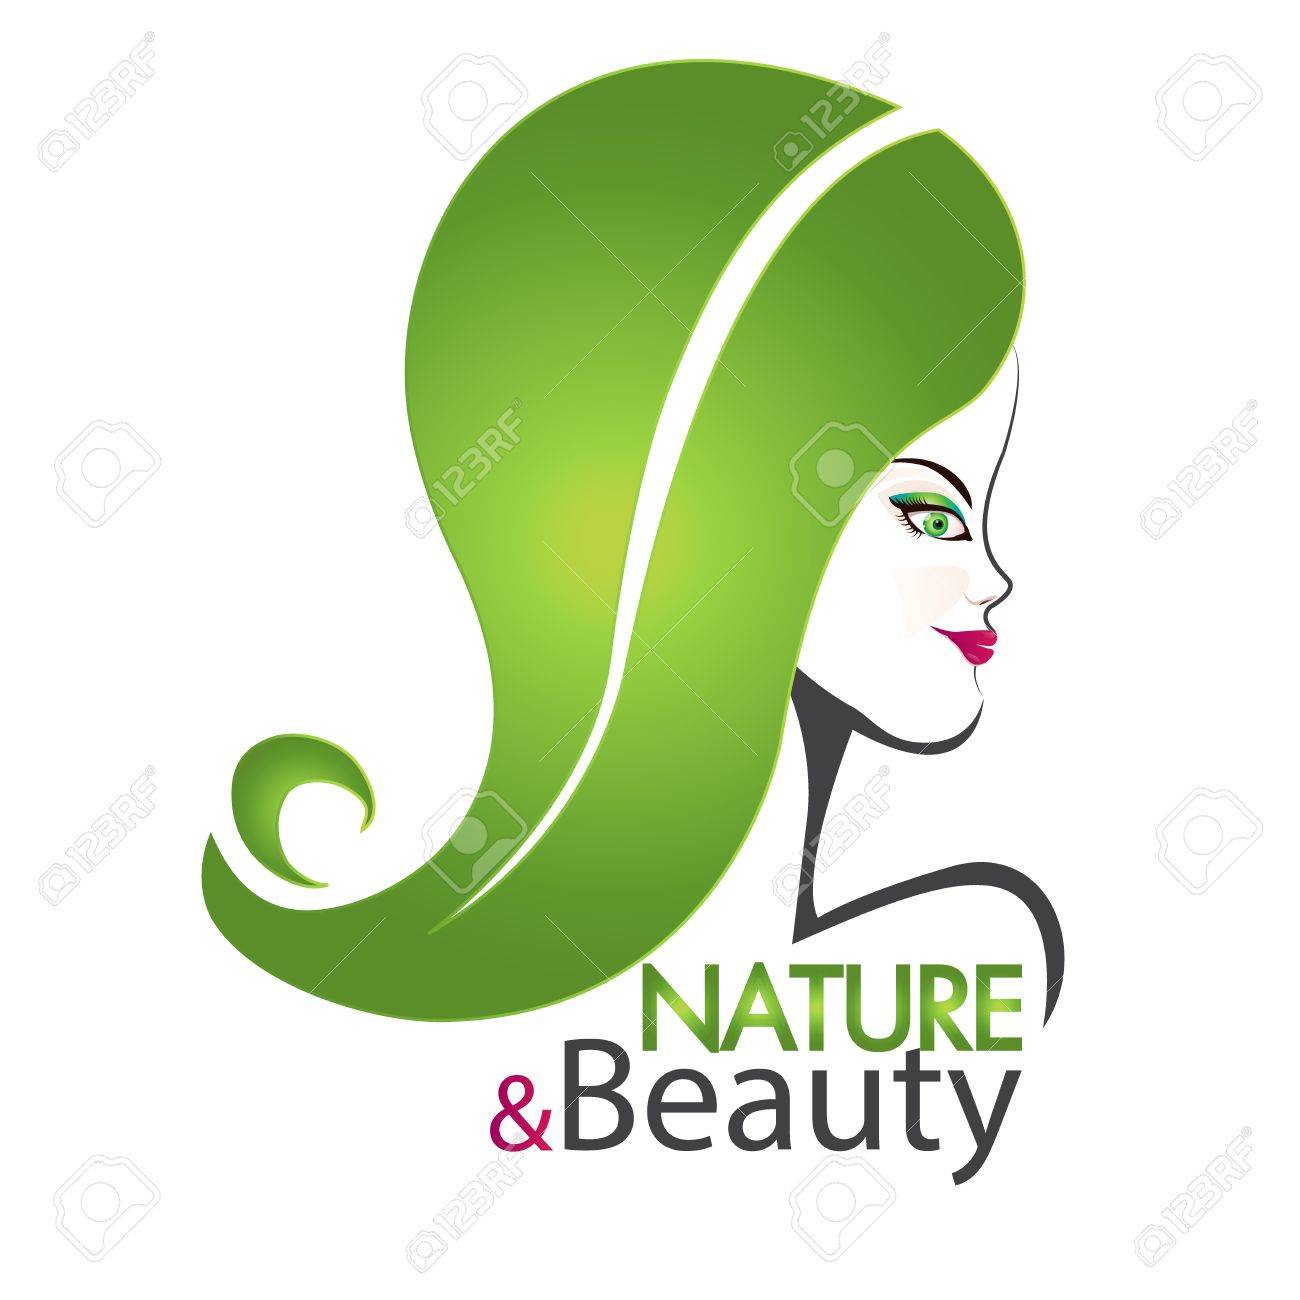 Kosmetiksalon logo  Natur Und Schönheit Frau Kosmetik Salon Logo Design Lizenzfrei ...